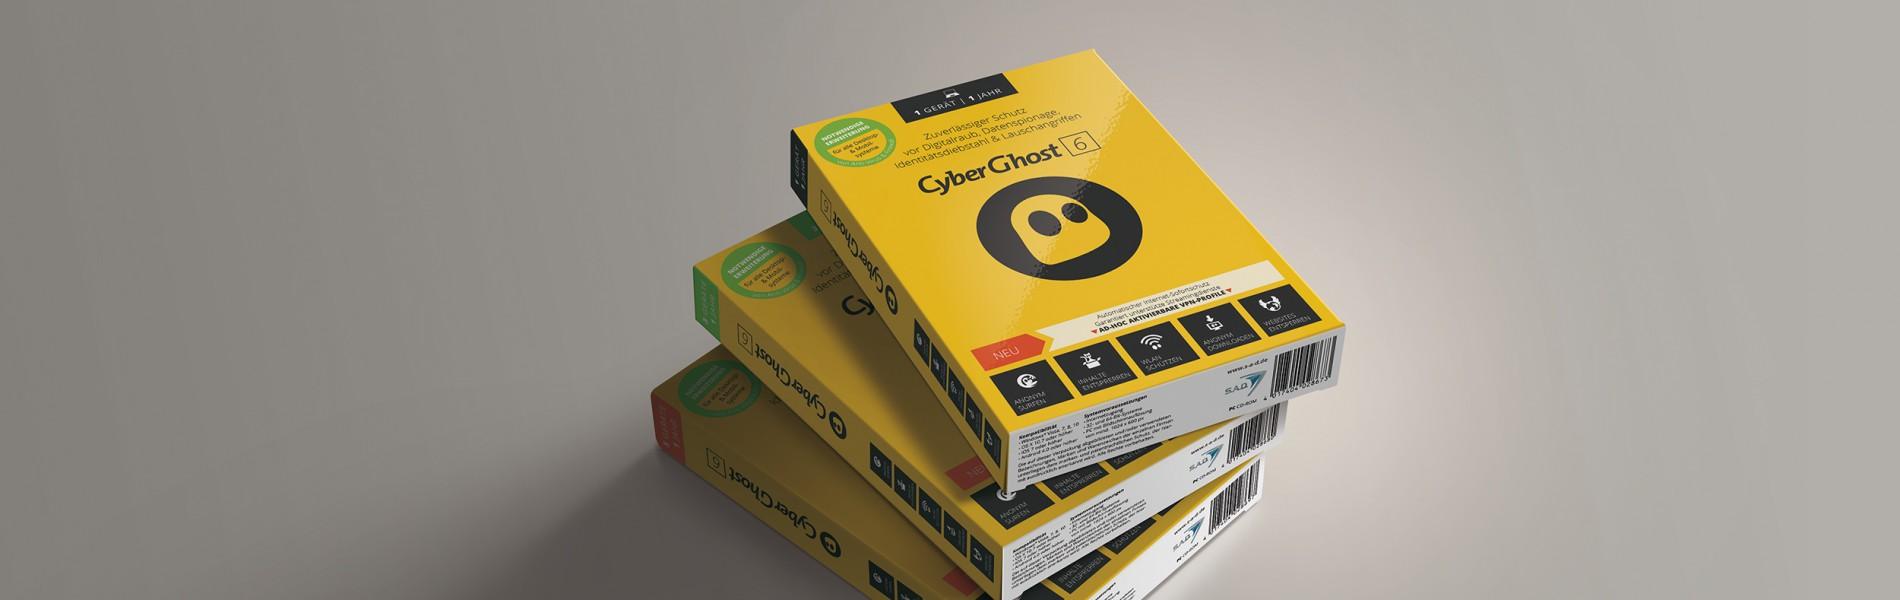 cyberghost sicher